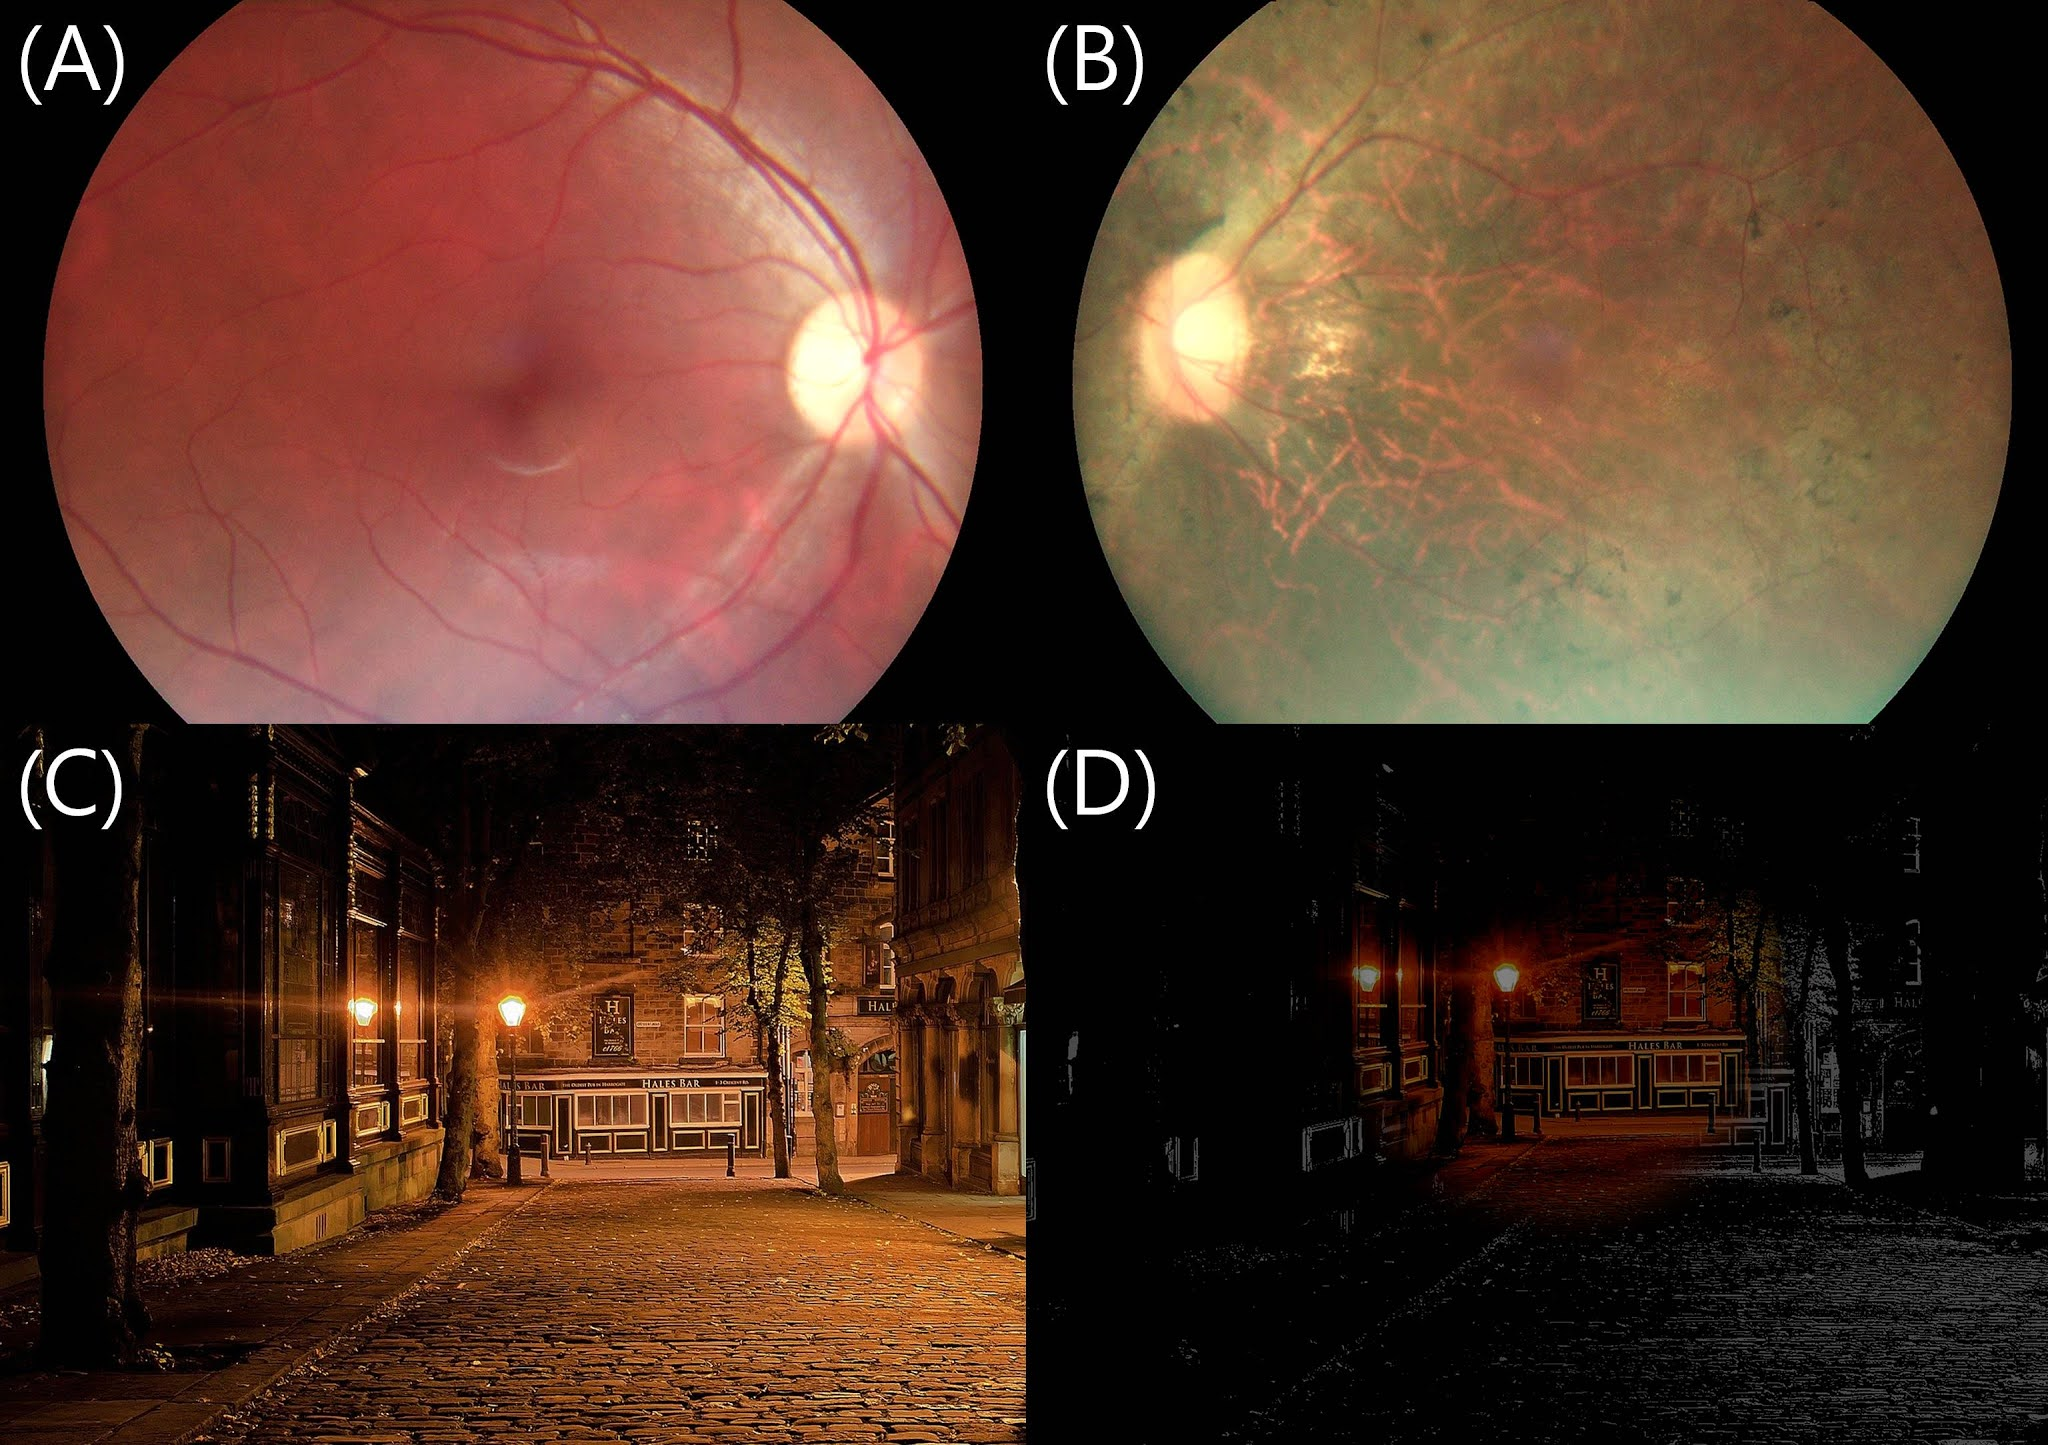 (A)正常眼睛與(B)視網膜色素變性的眼底攝影。(C)正常人的視野模擬圖與(D)夜盲症患者看到的視野